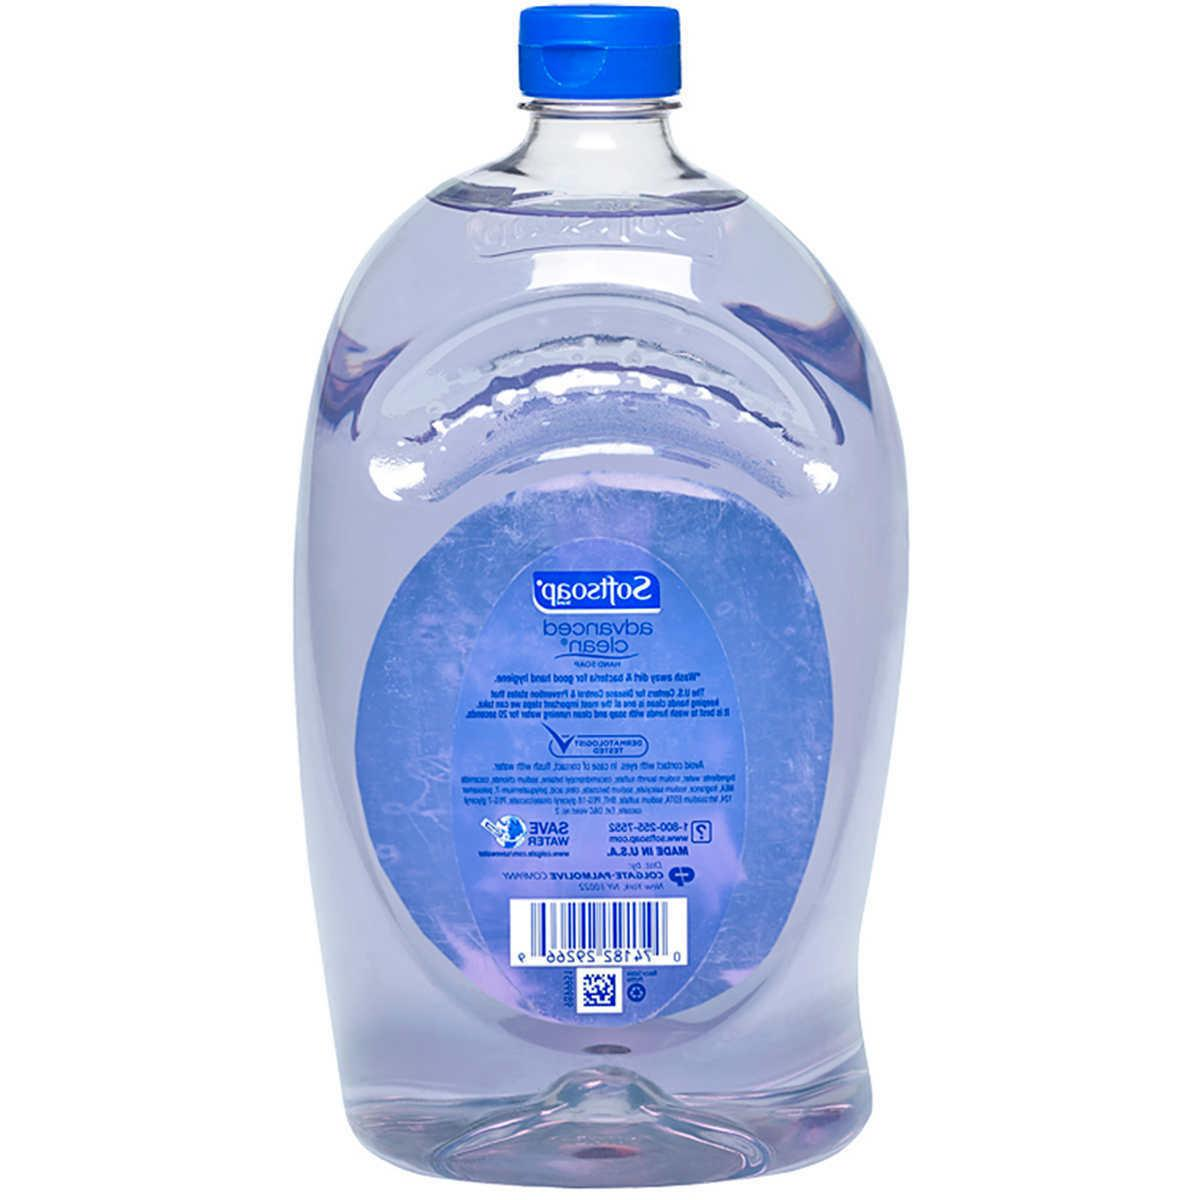 Softsoap Soap Refill - 80oz